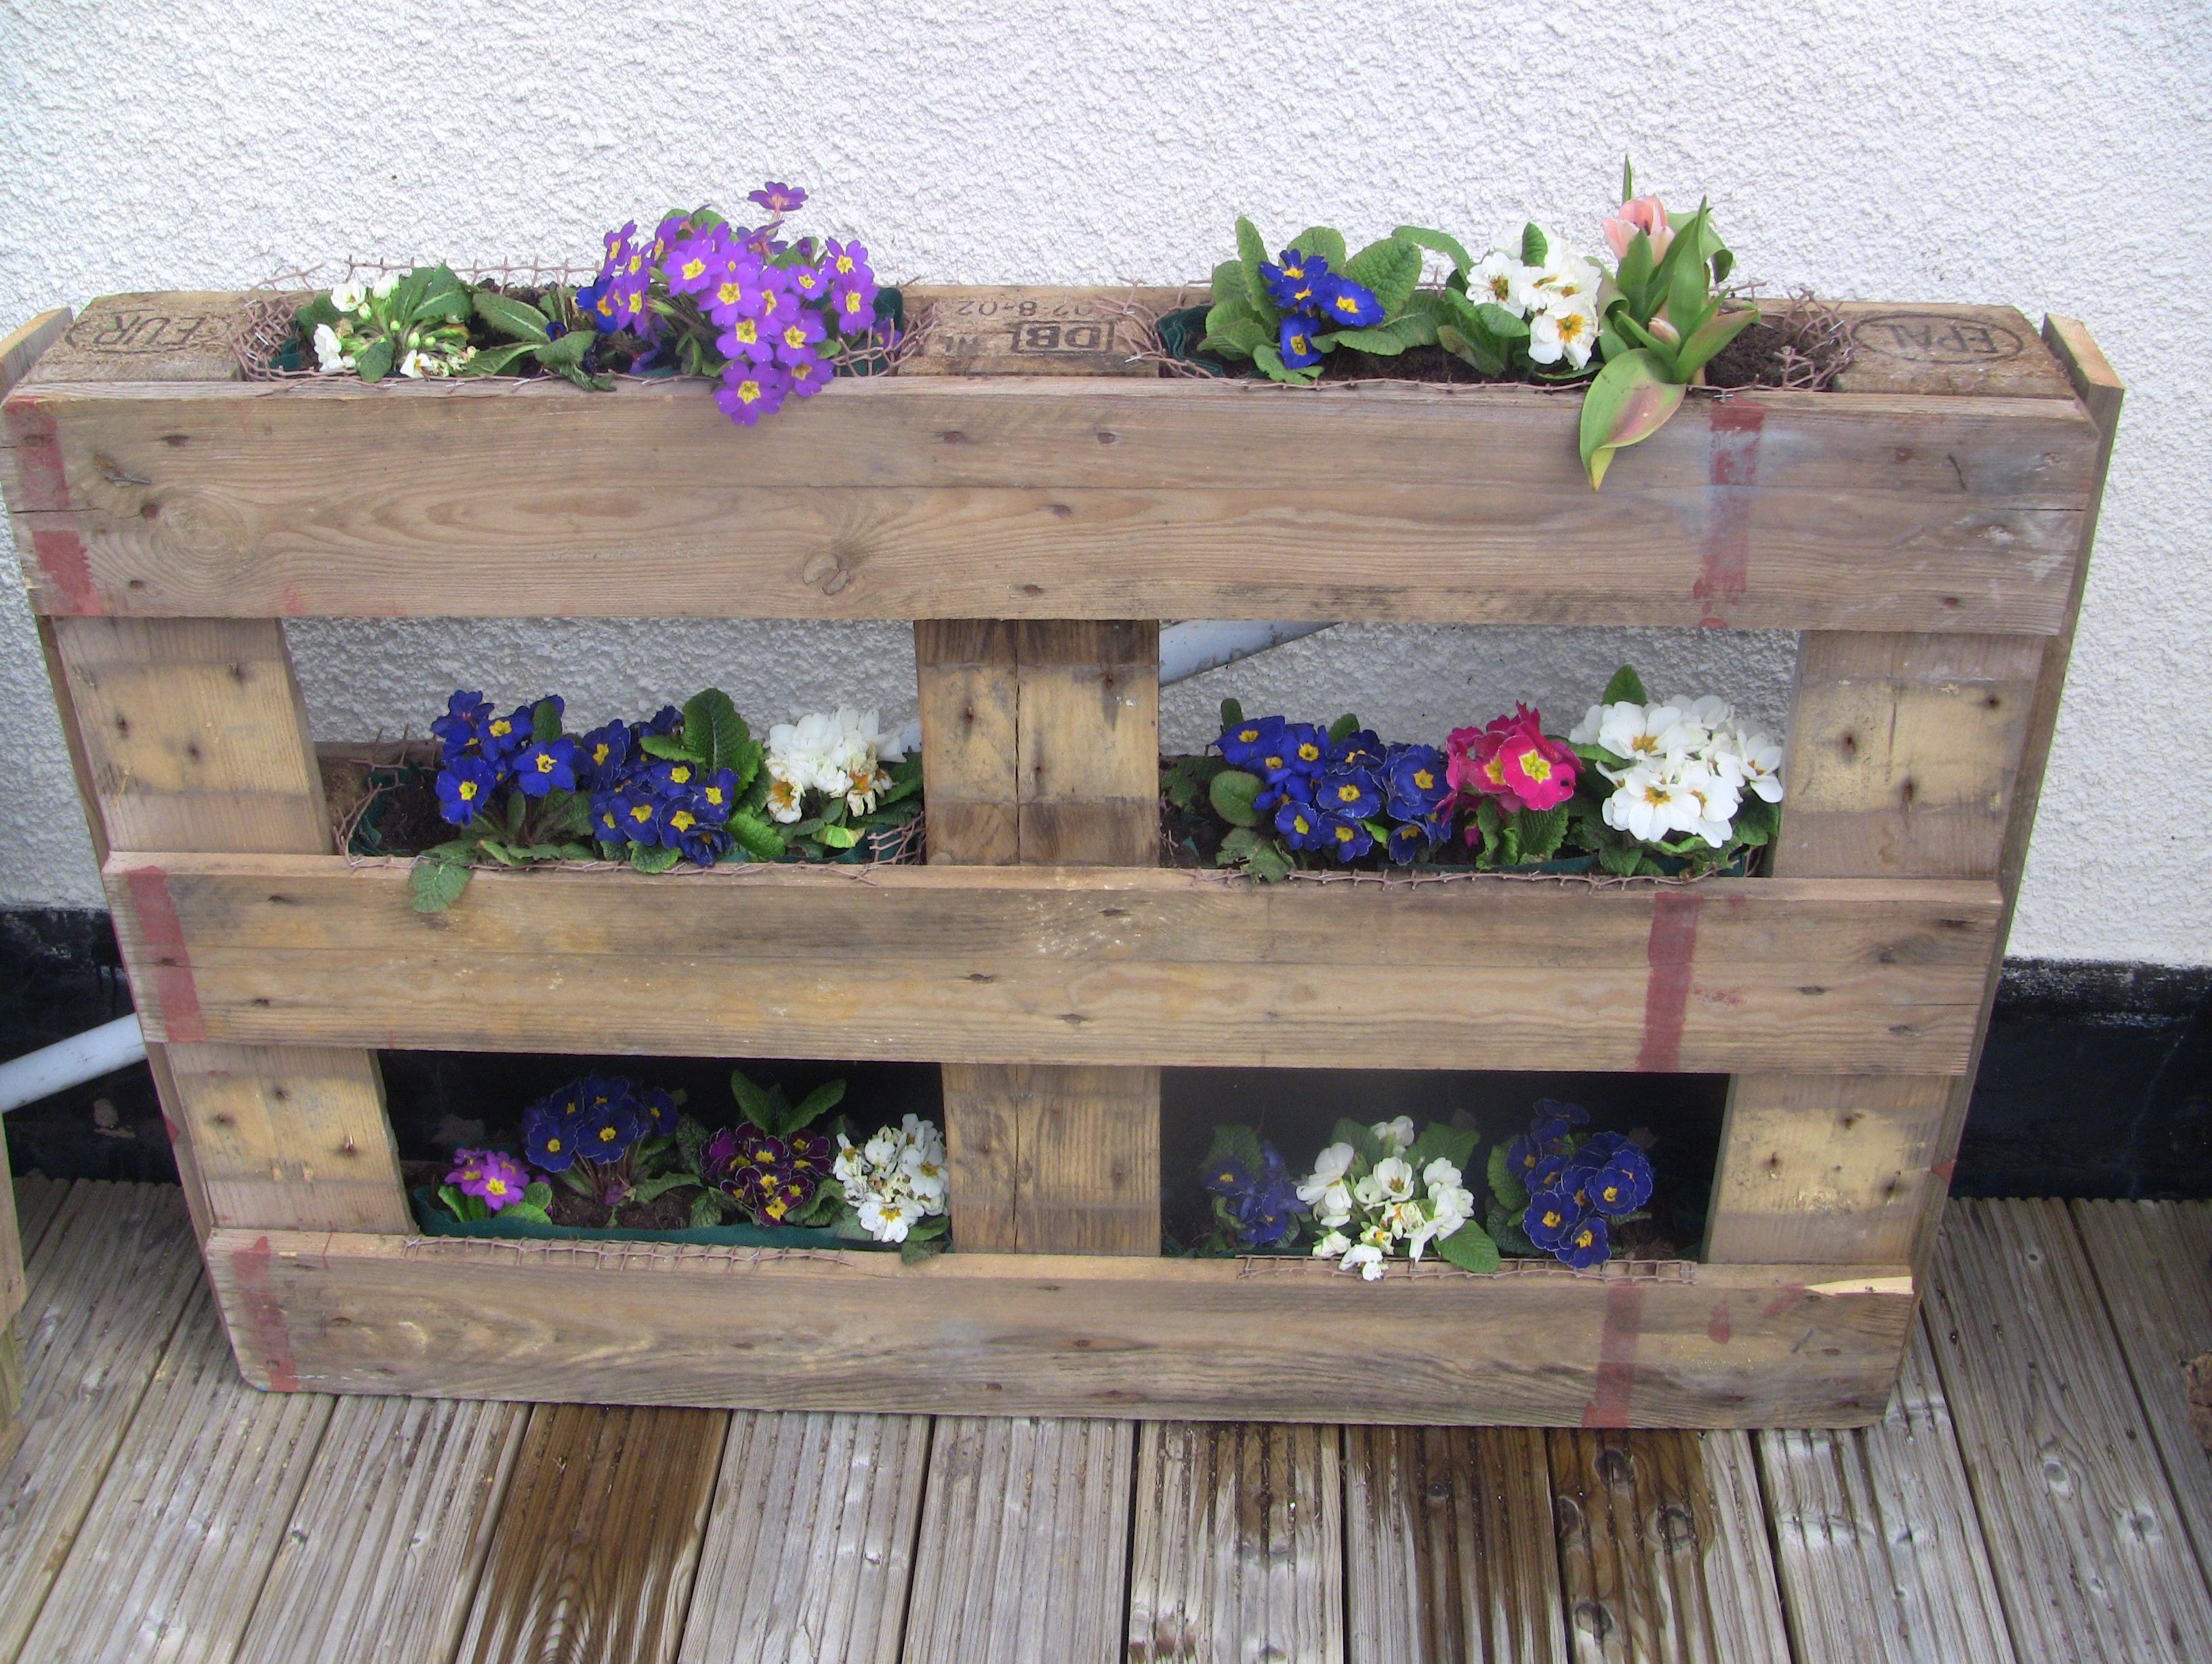 Upcycled Wooden Pallet - Vertical Gardening ideas | ShabbyShe on Pallet Design Ideas  id=38872